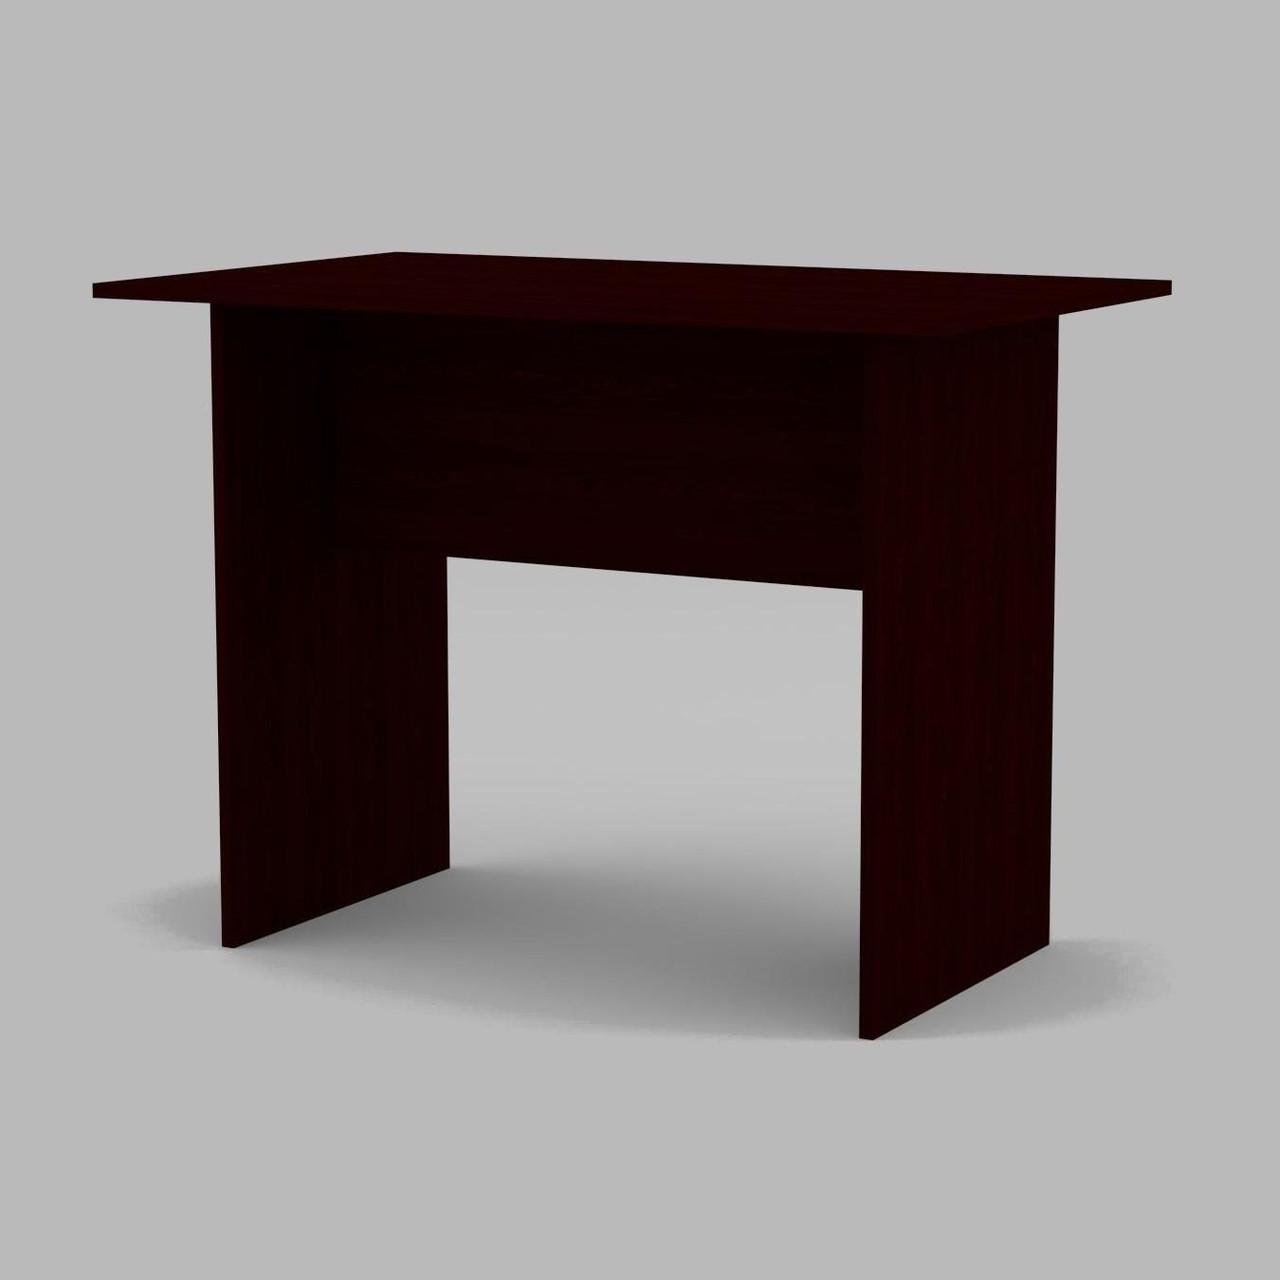 Письменный стол Компанит МО-1 1000х600х736 мм венге